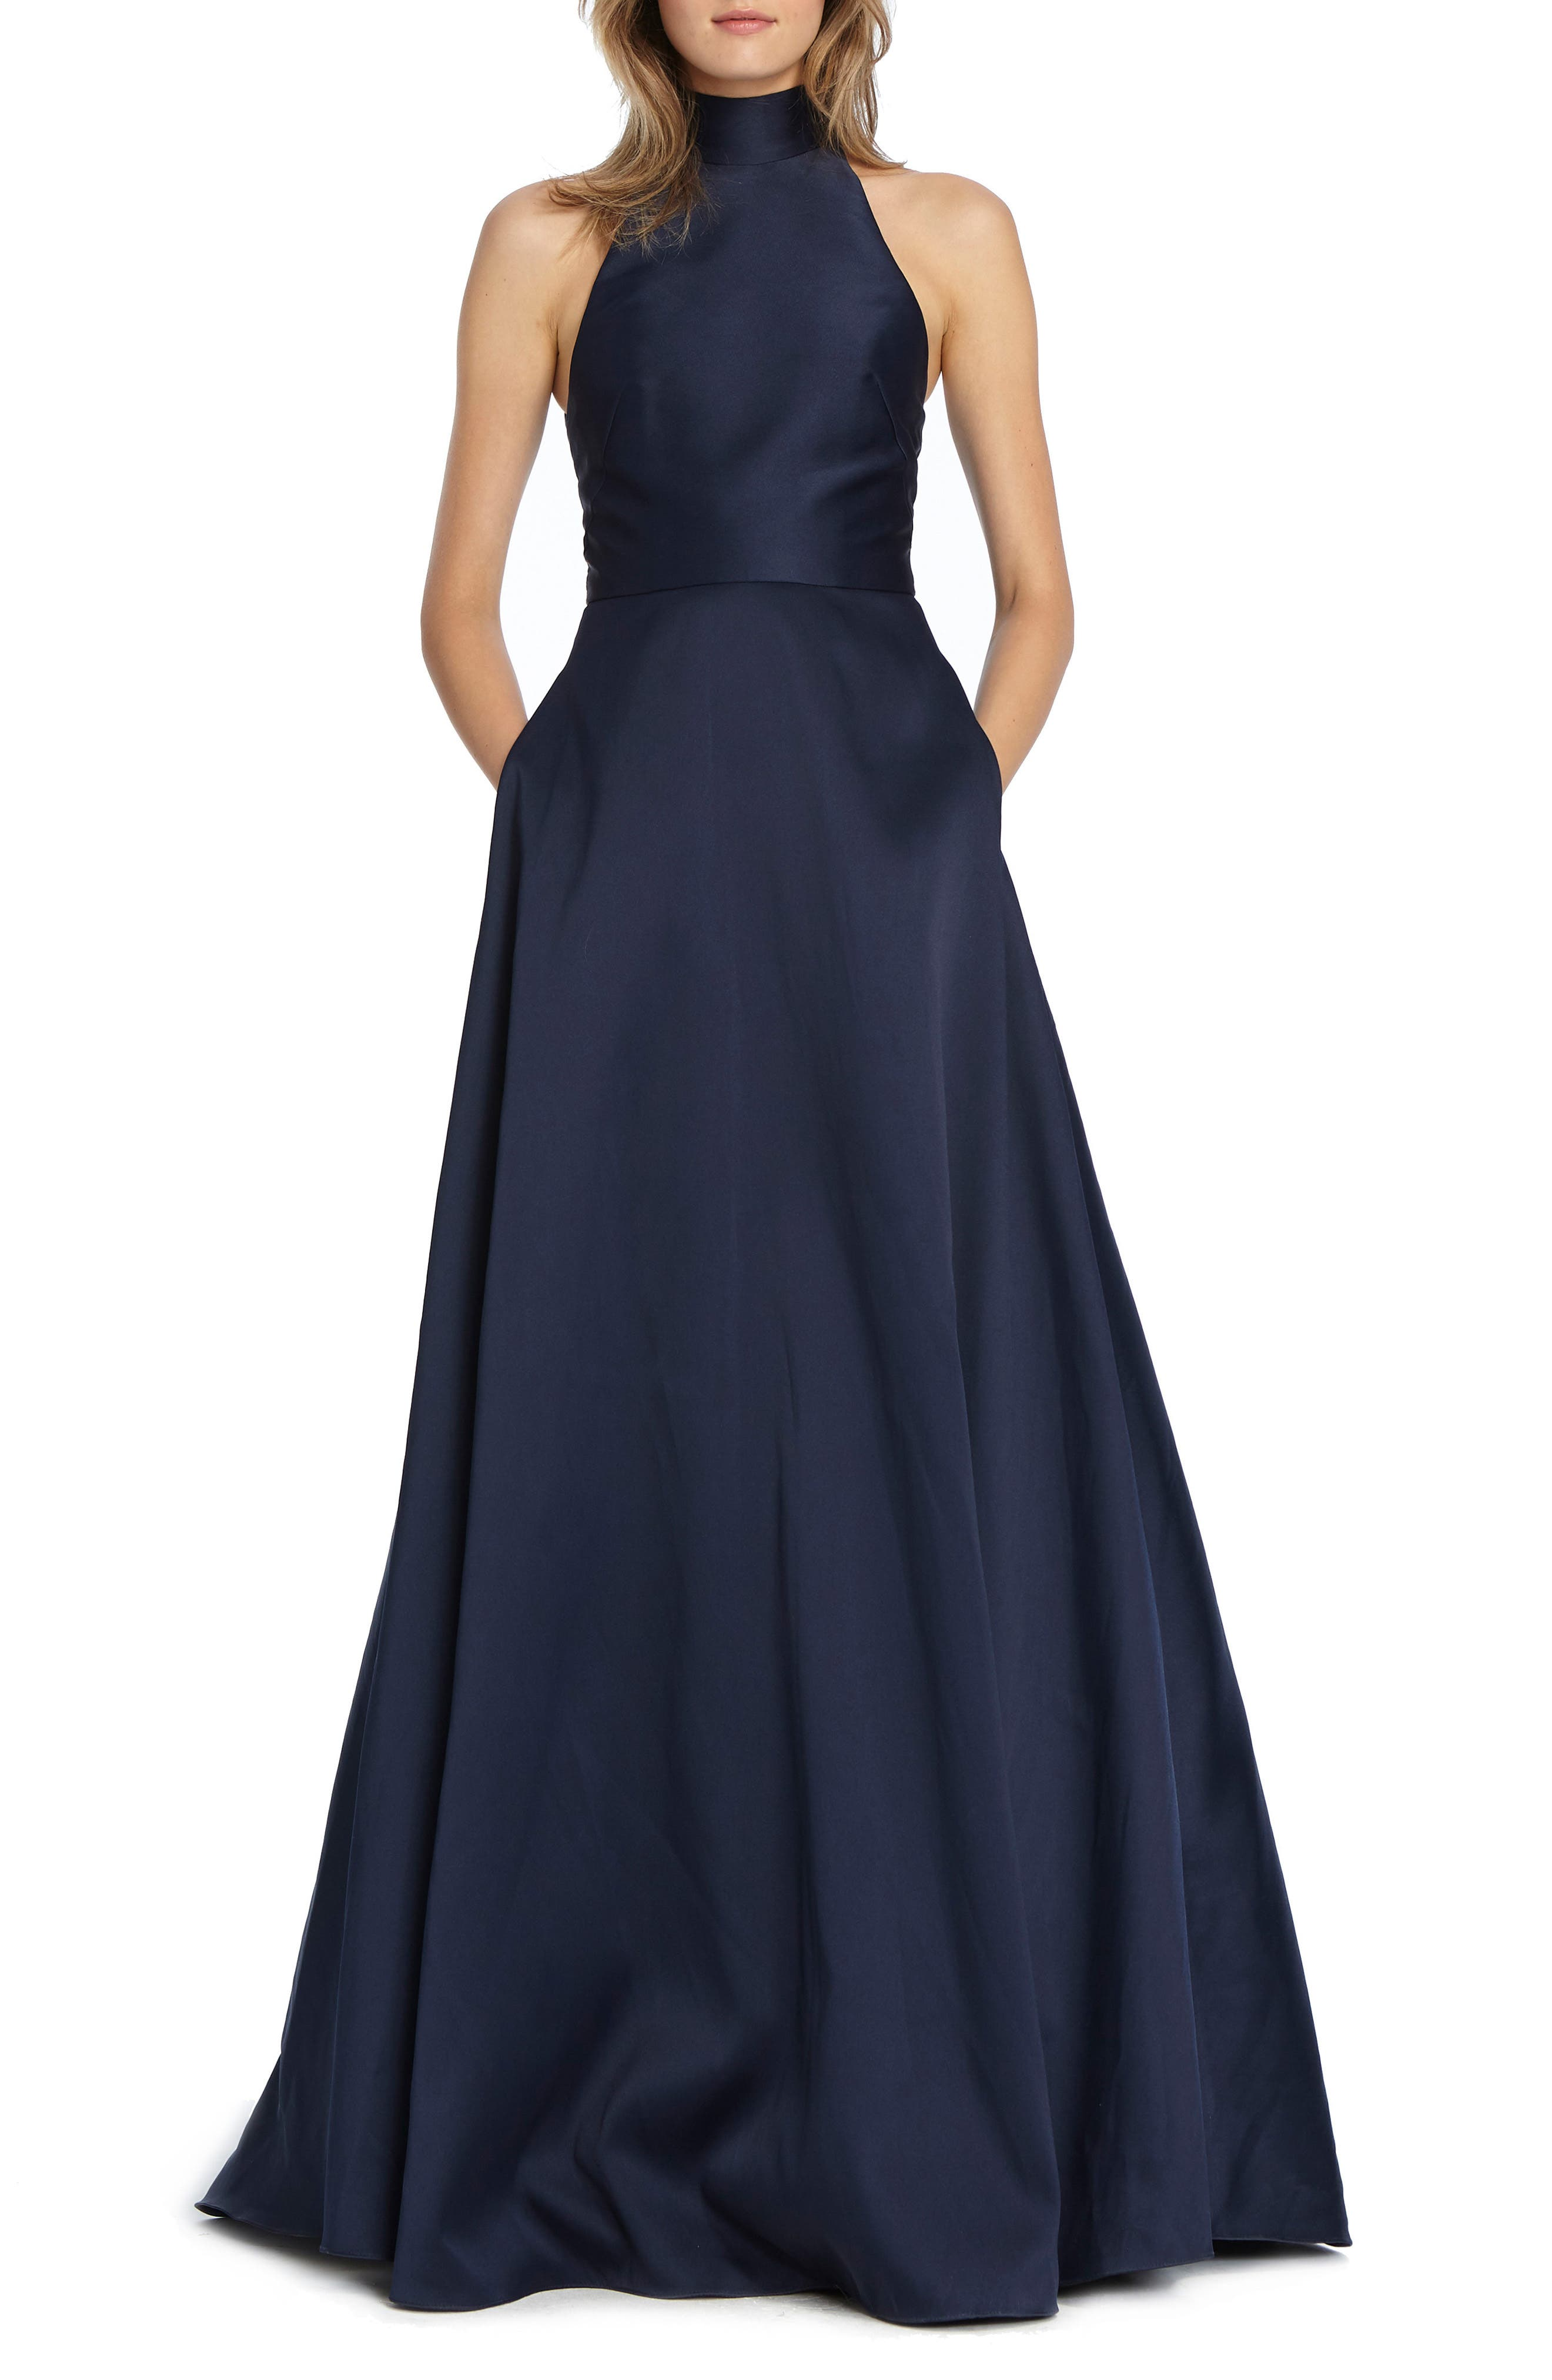 Ml Monique Lhuillier Satin Mock Neck Evening Dress